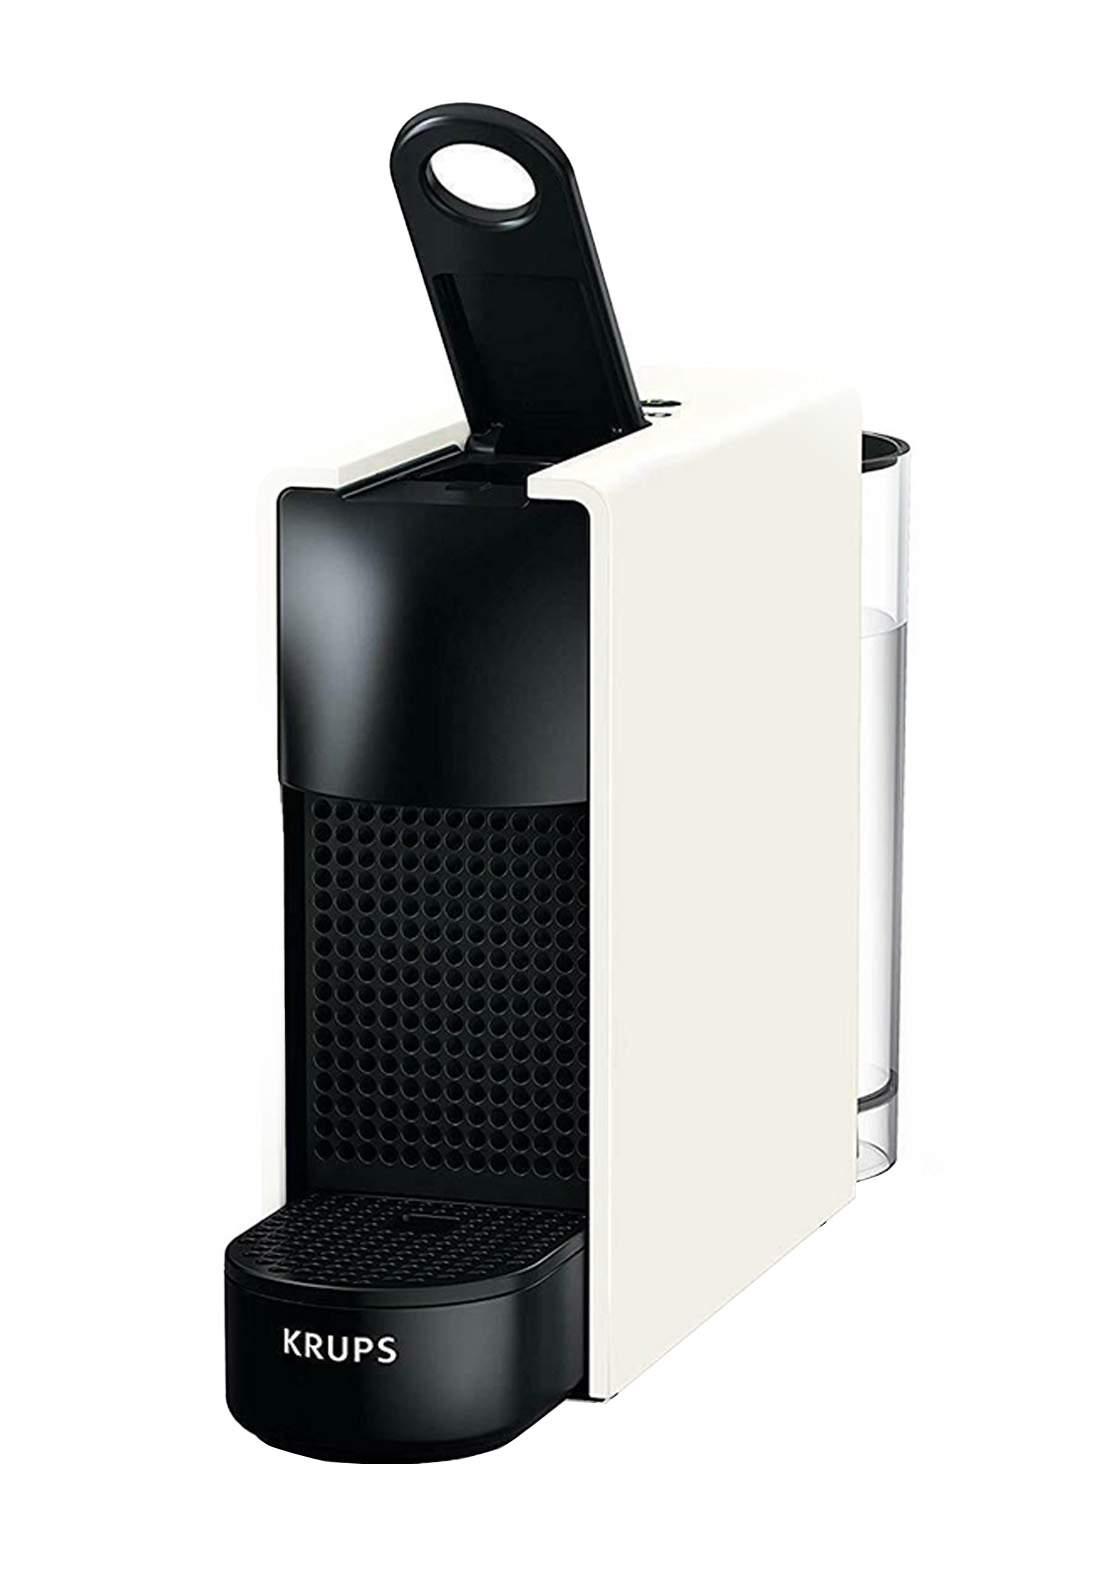 Krups xn110199 Coffee Machine 1310 Watt ماكنة صنع قهوة